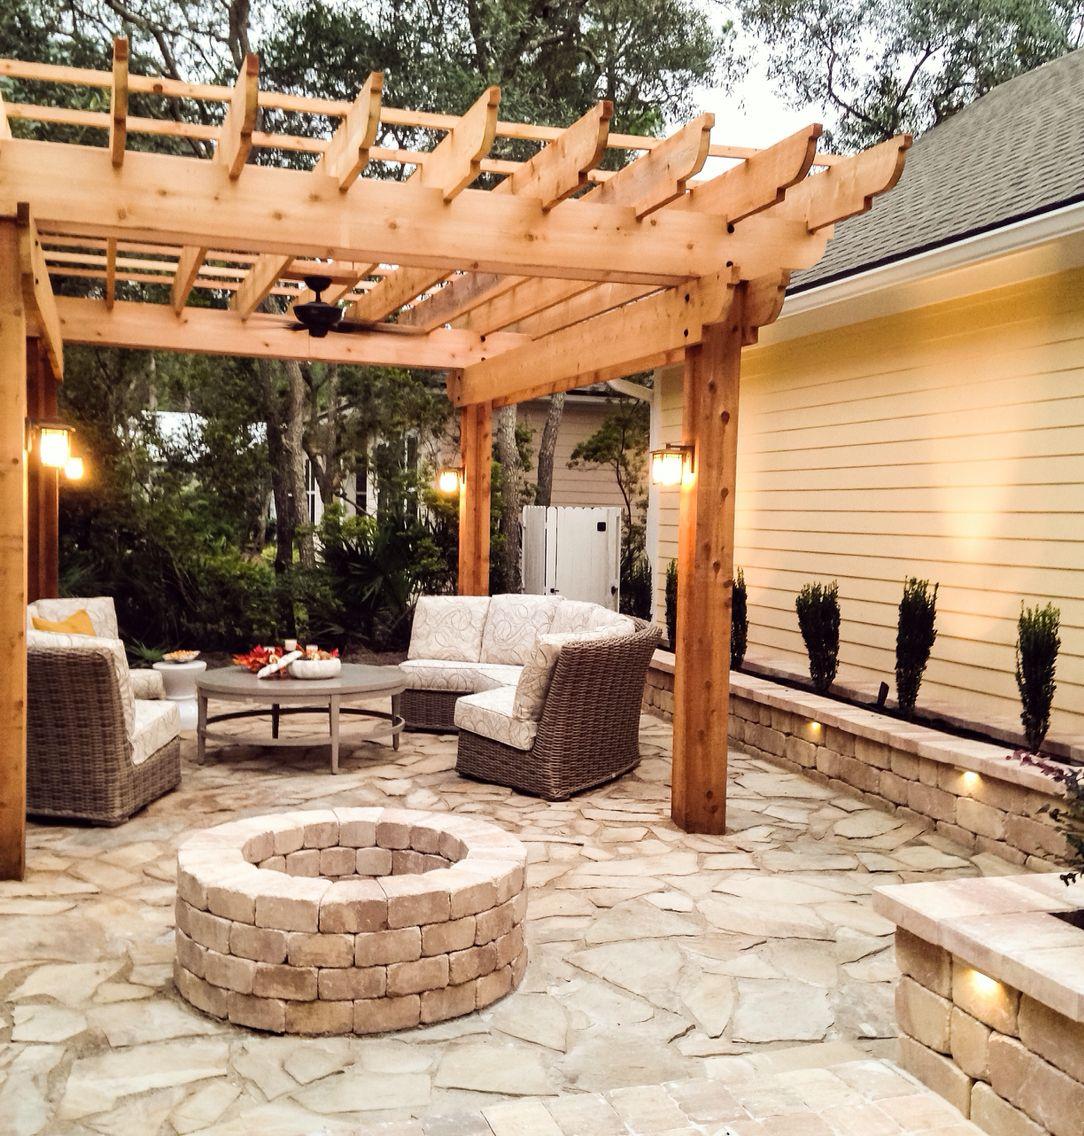 pergola pavers flagstone patio fire pit backyard lawn